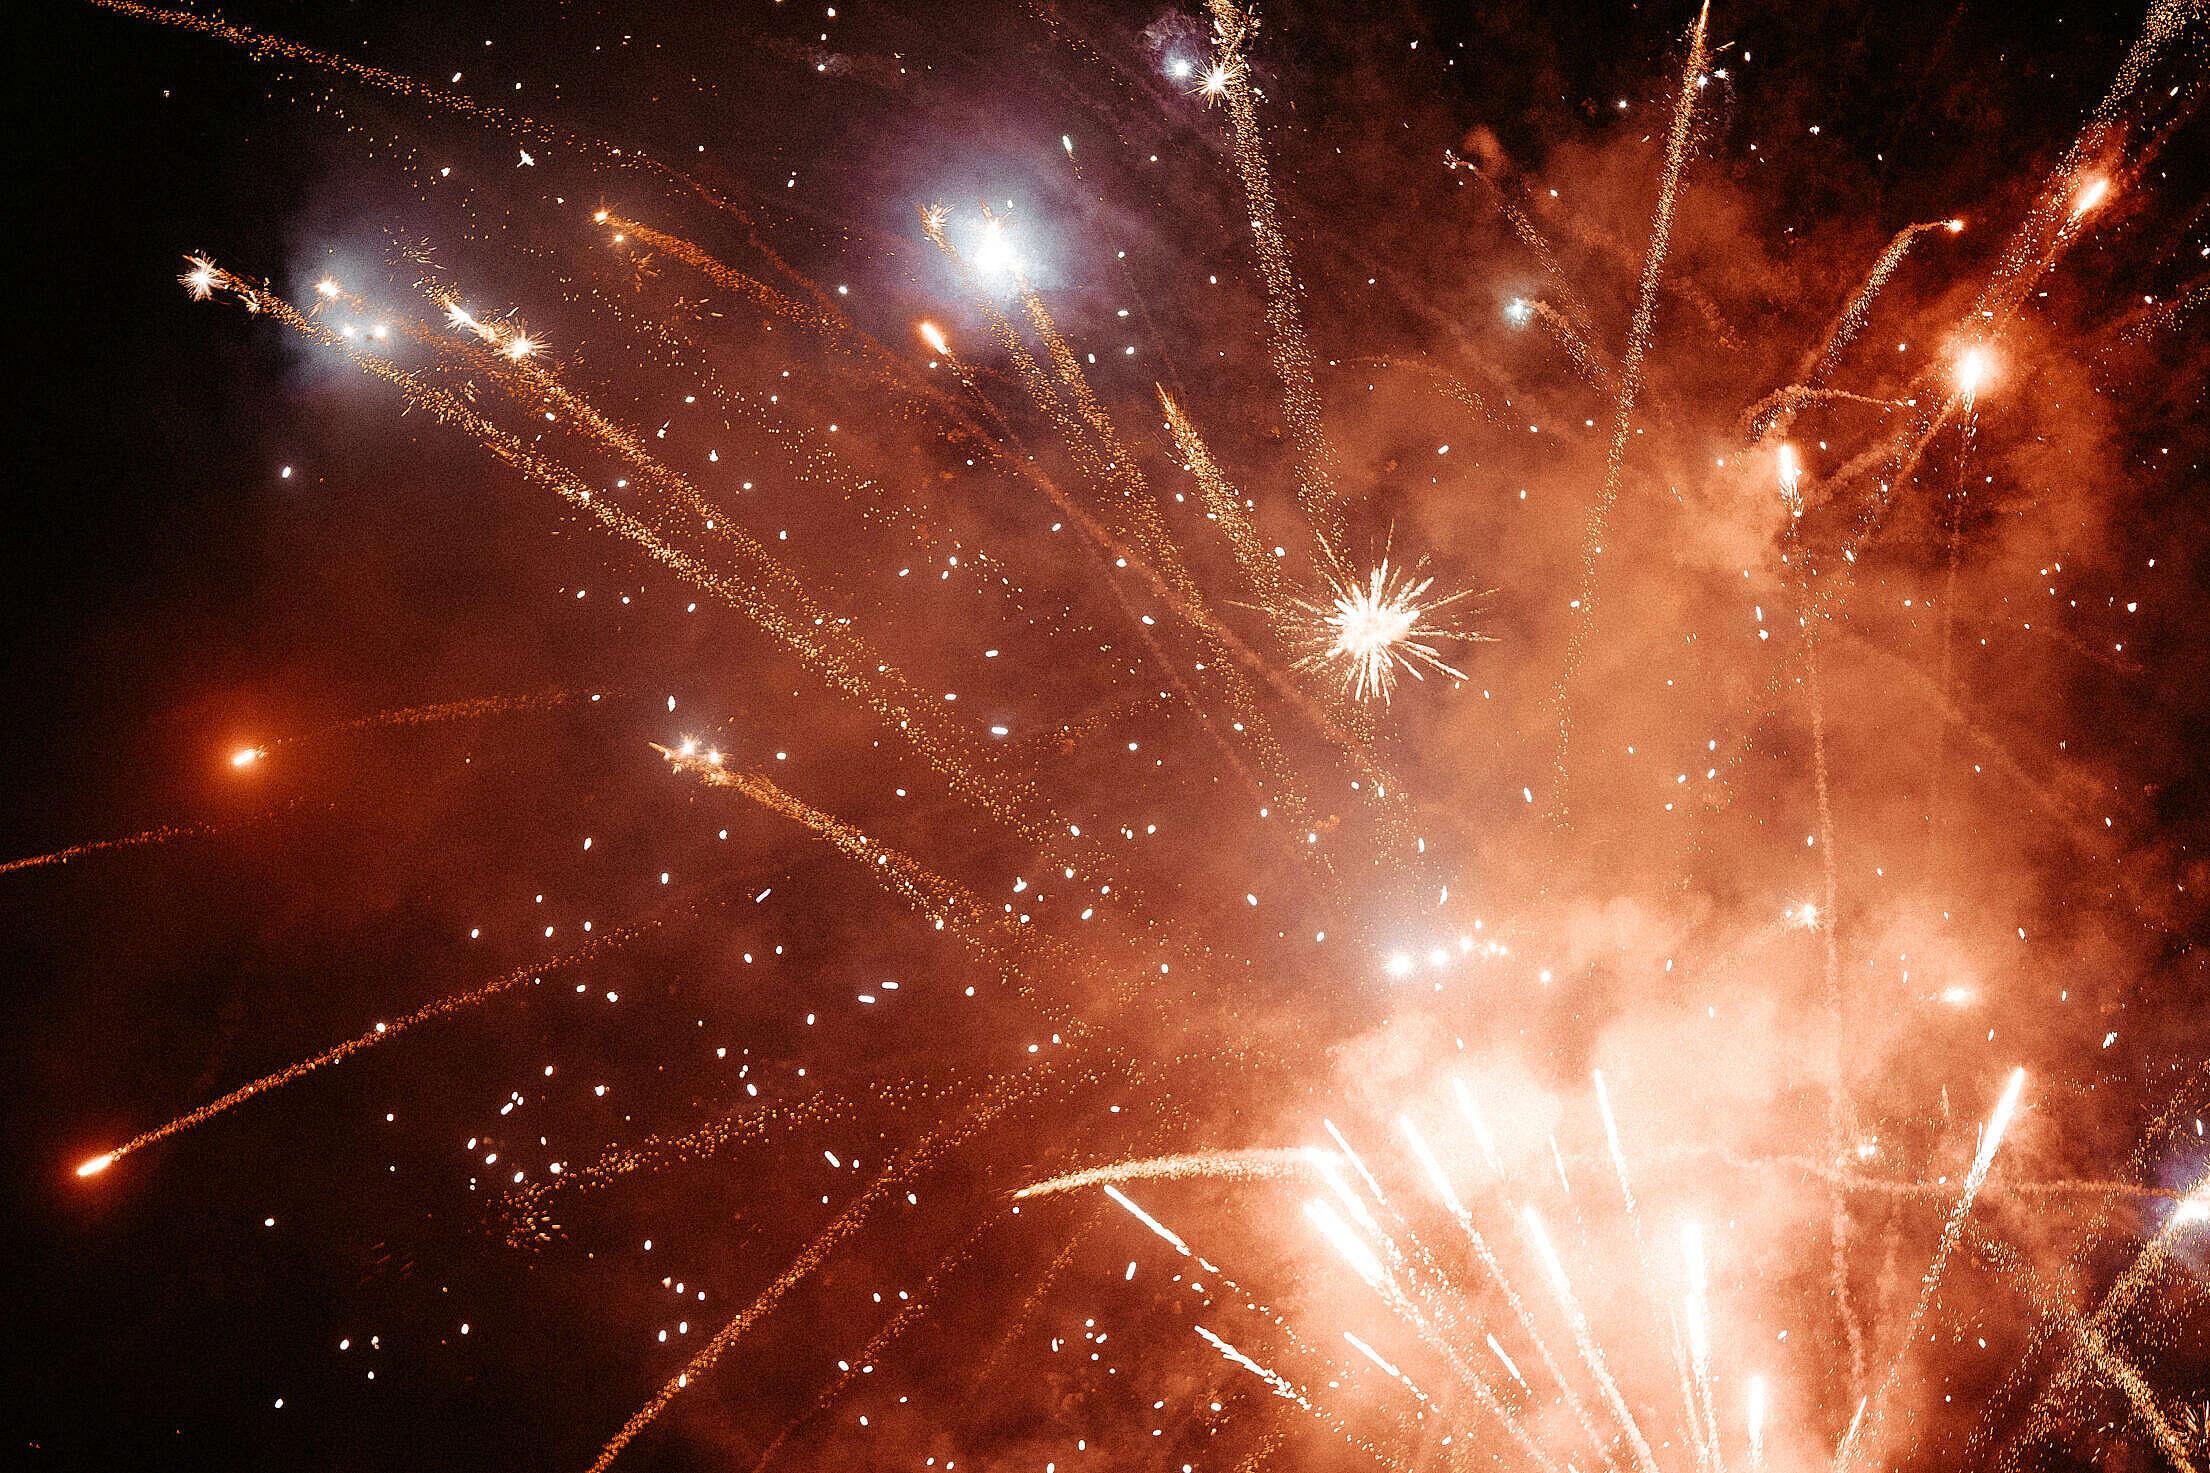 Fireworks Background Free Stock Photo